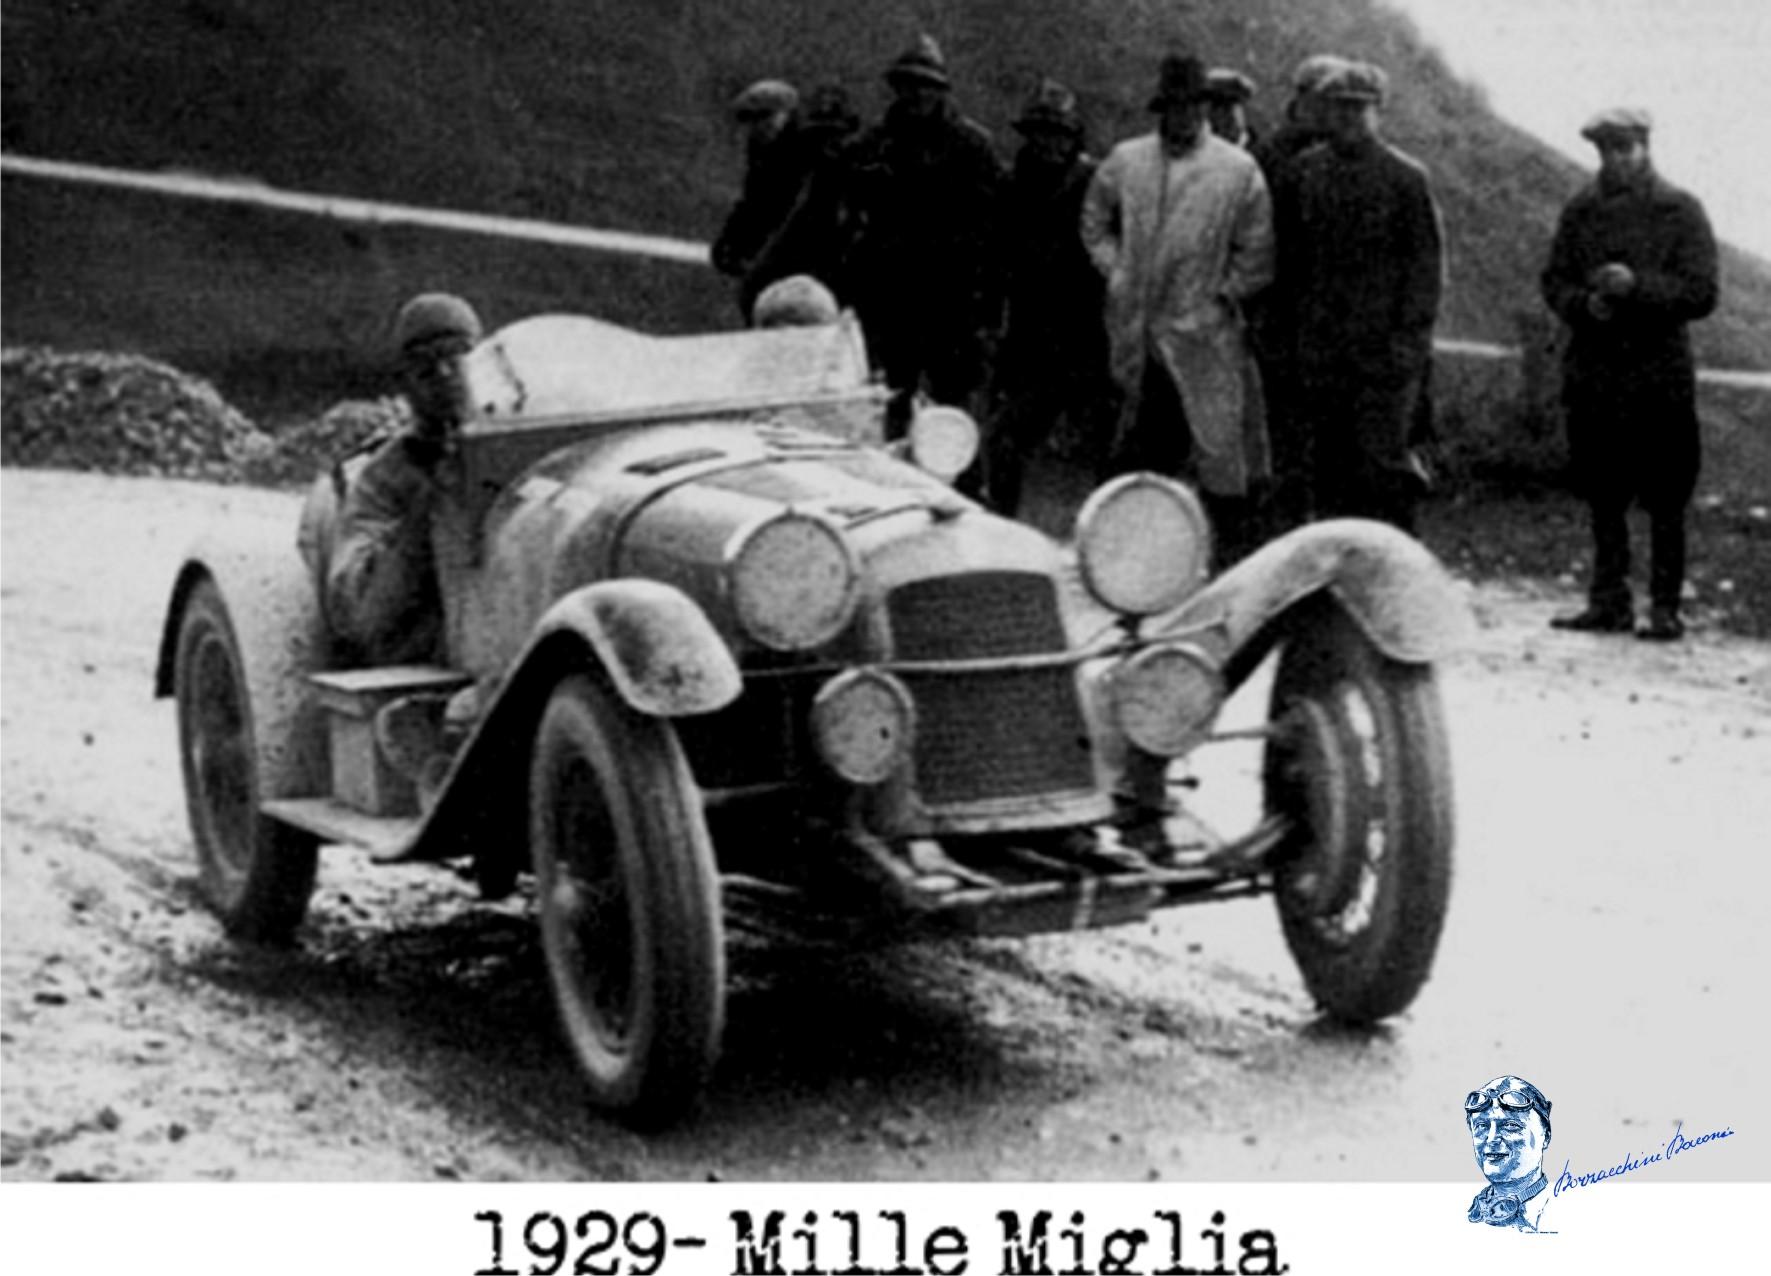 1929 mm maserati 26B MM 5